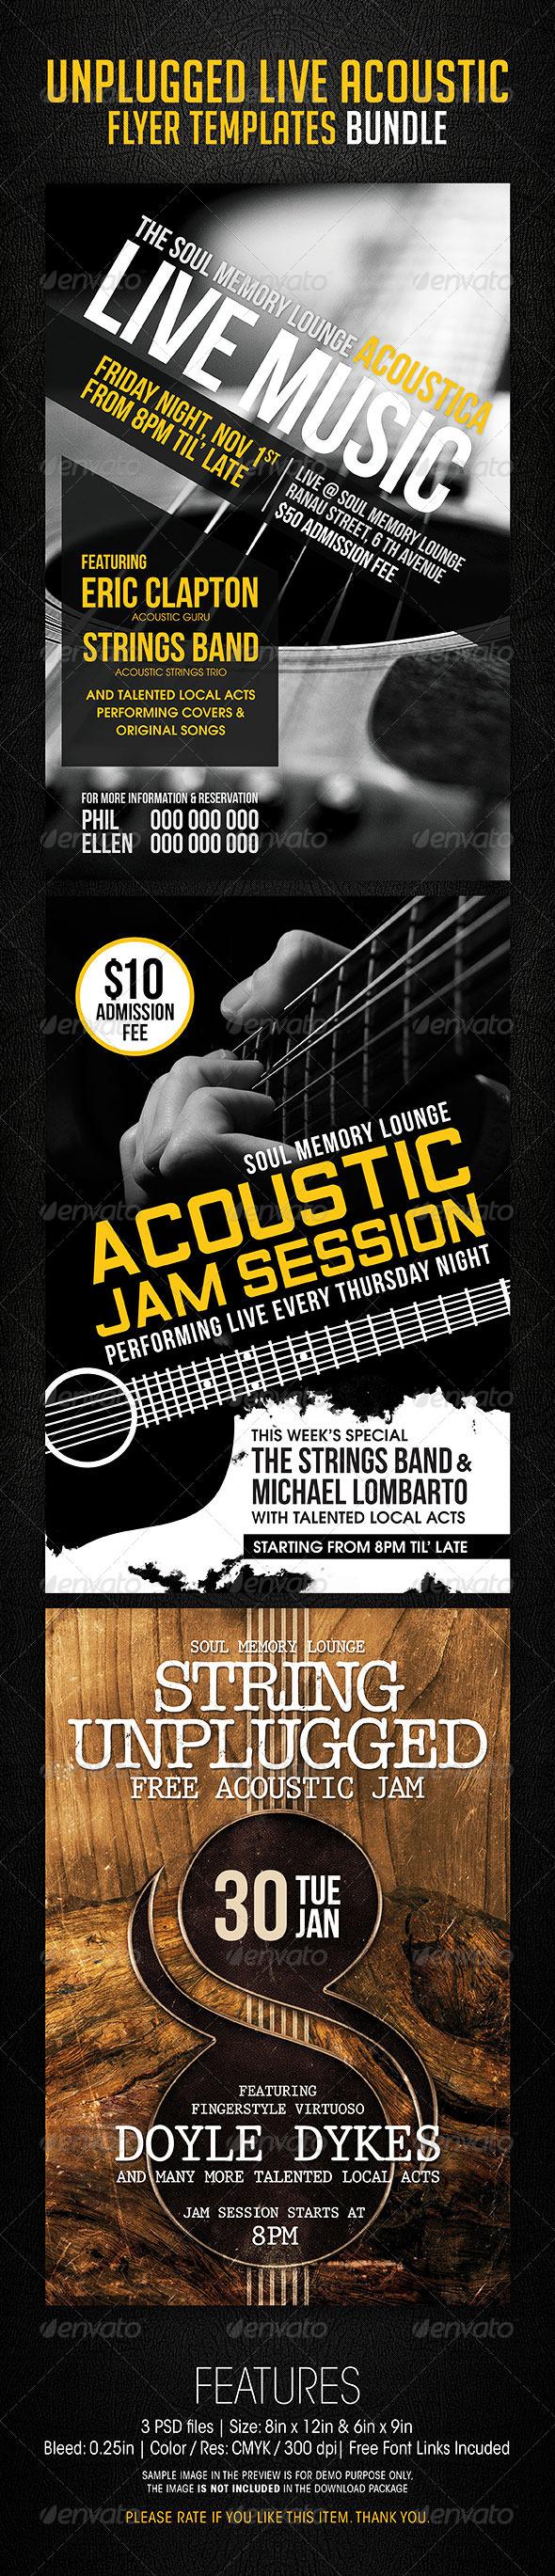 GraphicRiver Unplugged Live Acoustic Flyer Templates Bundle 6704858